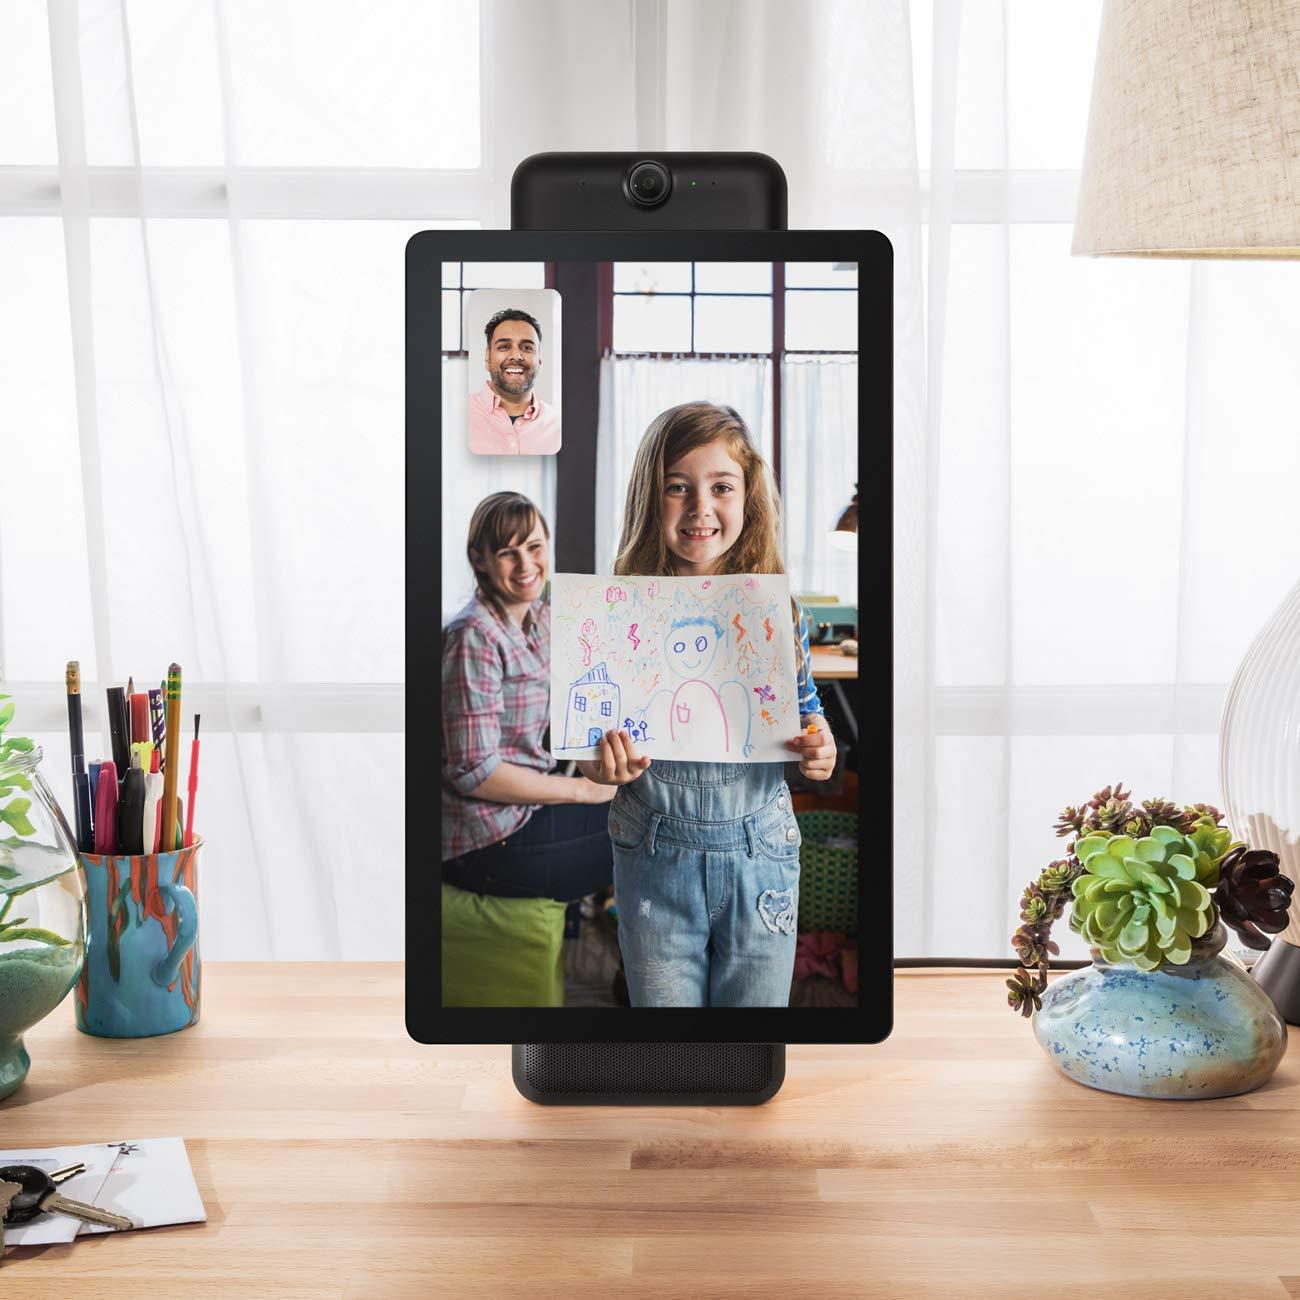 Facebook Portal Plus Rotating Video ChatFacebook Portal Plus Rotating Video Chat